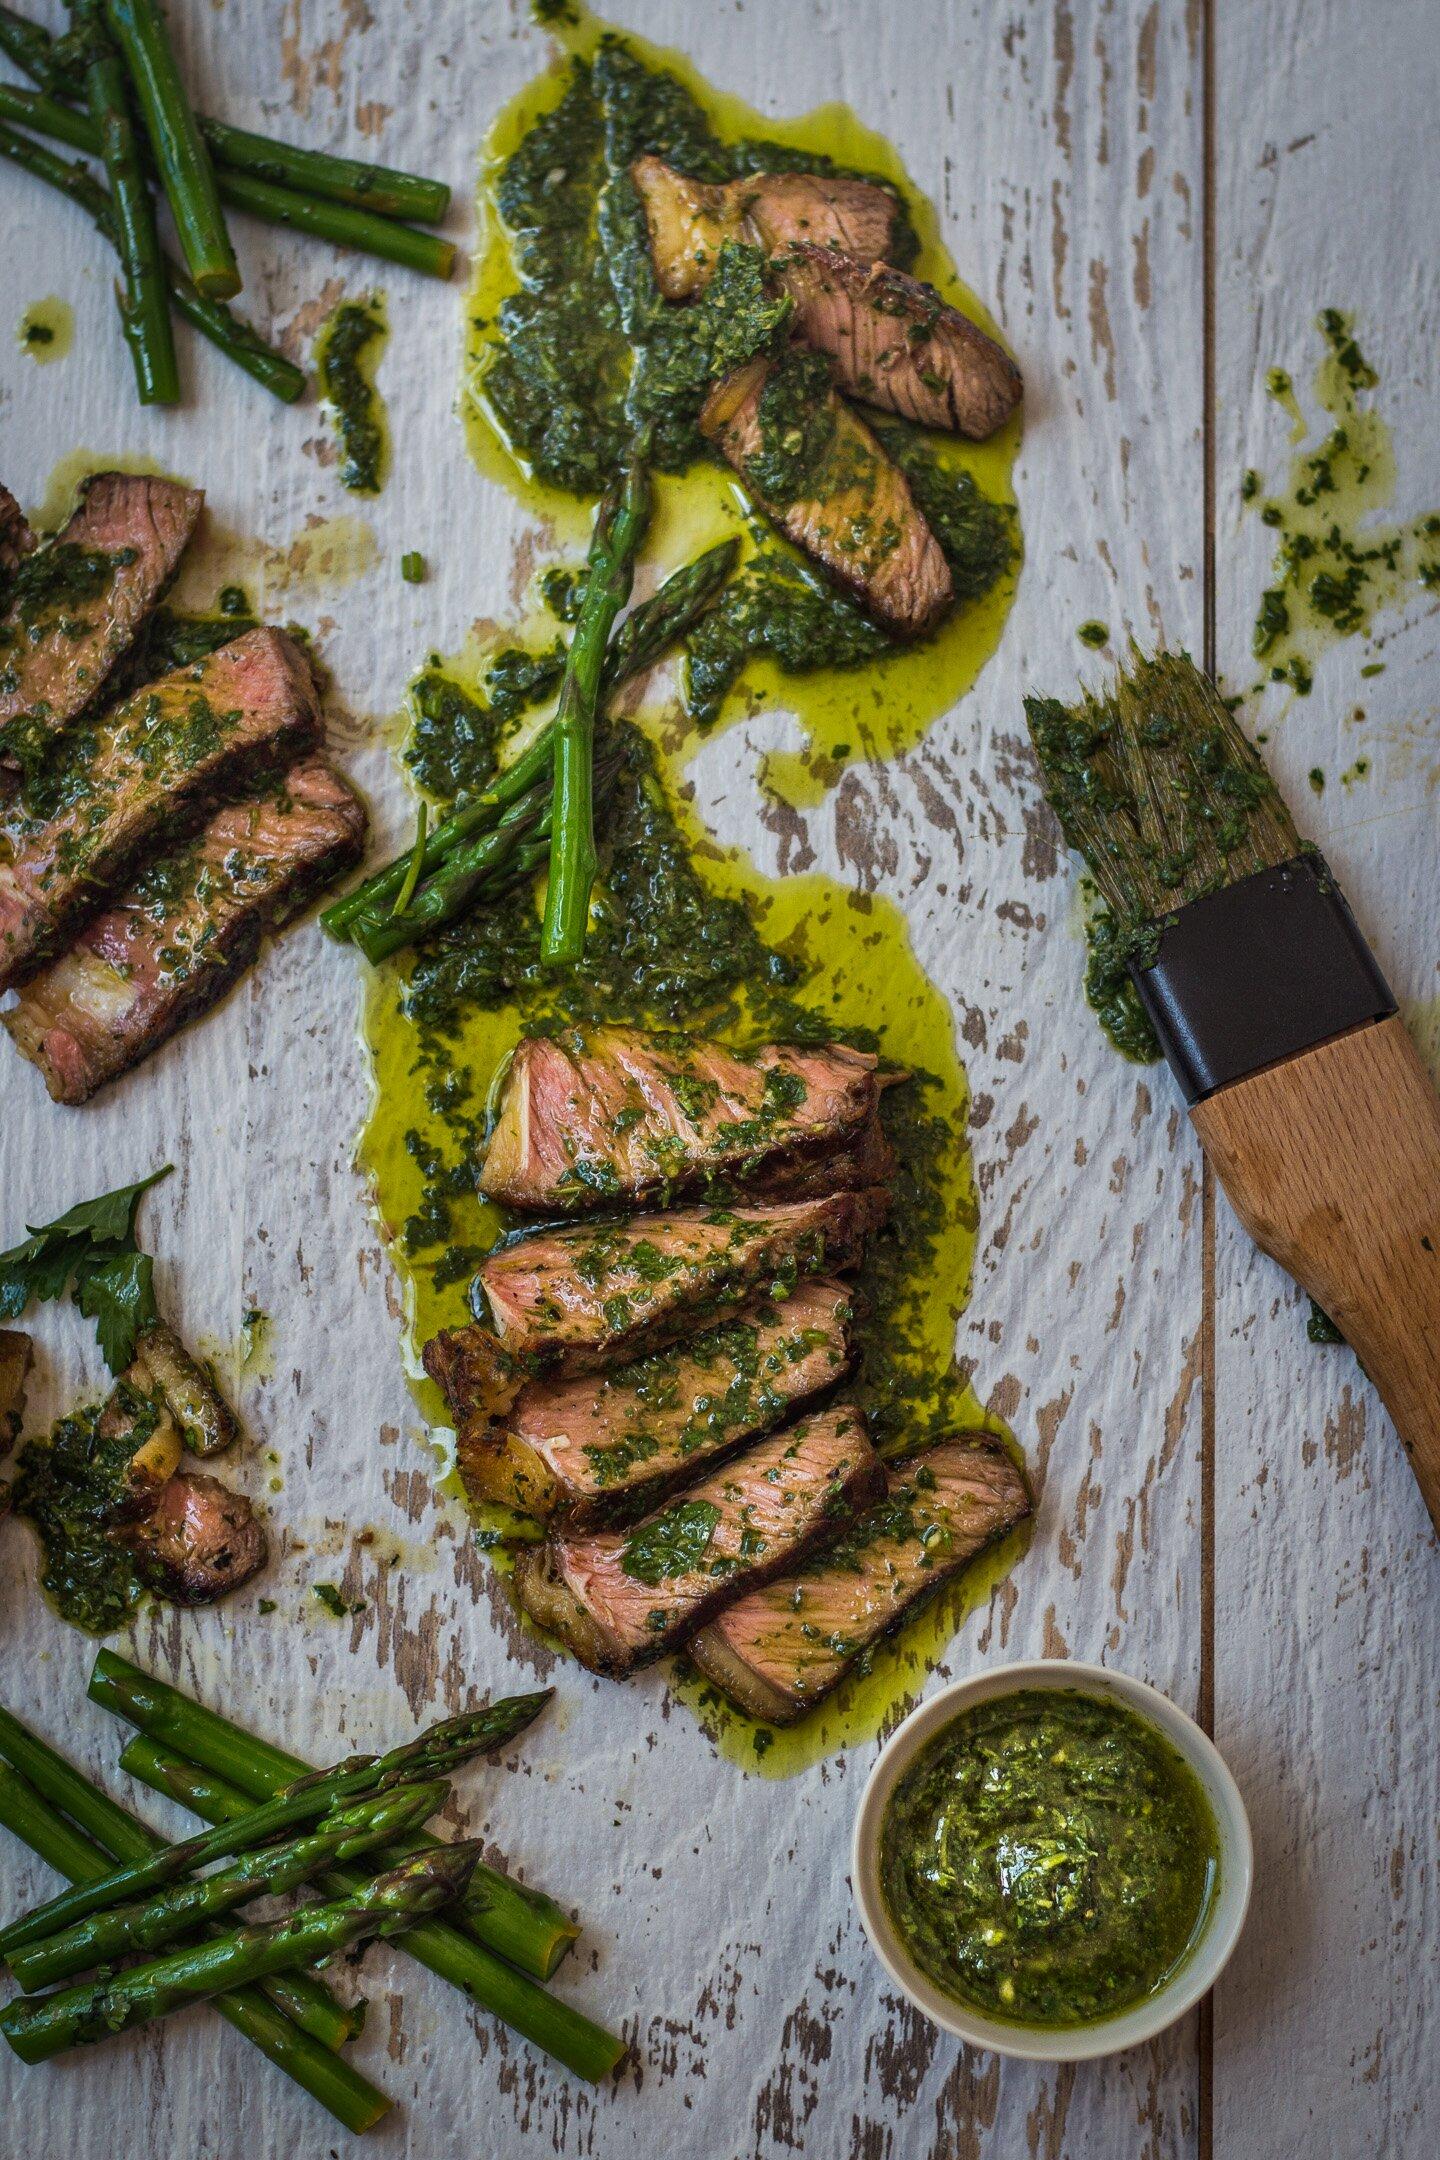 steak-with-chimichurri-sauce-recipe-3